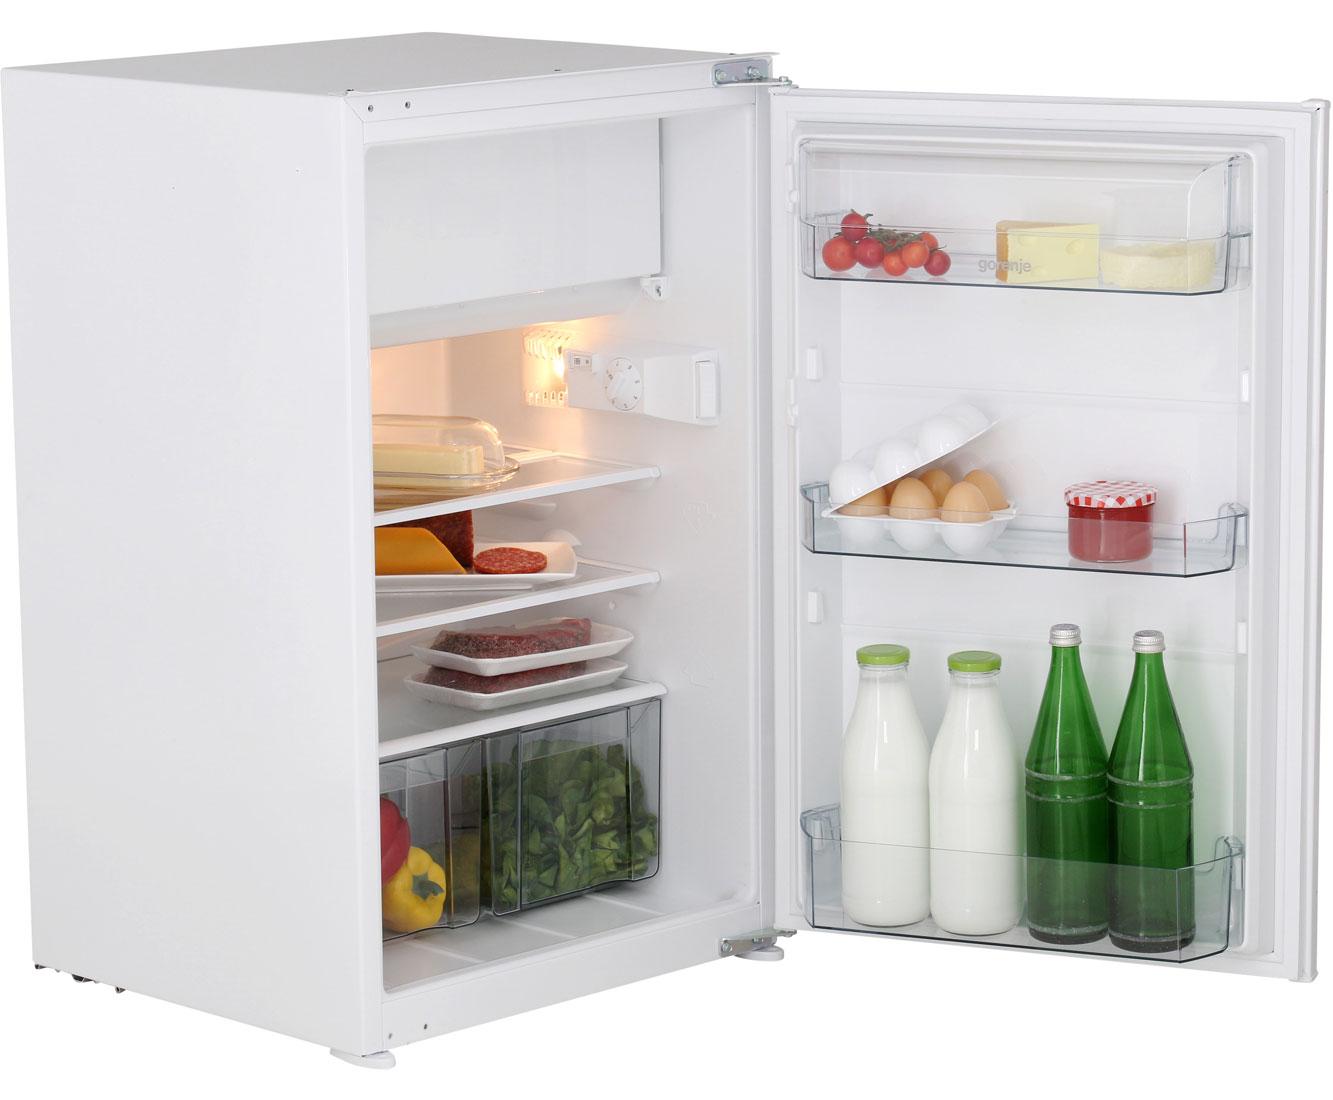 Kühlschrank Ohne Gefrierfach : Gorenje rbi aw einbau kühlschrank mit gefrierfach er